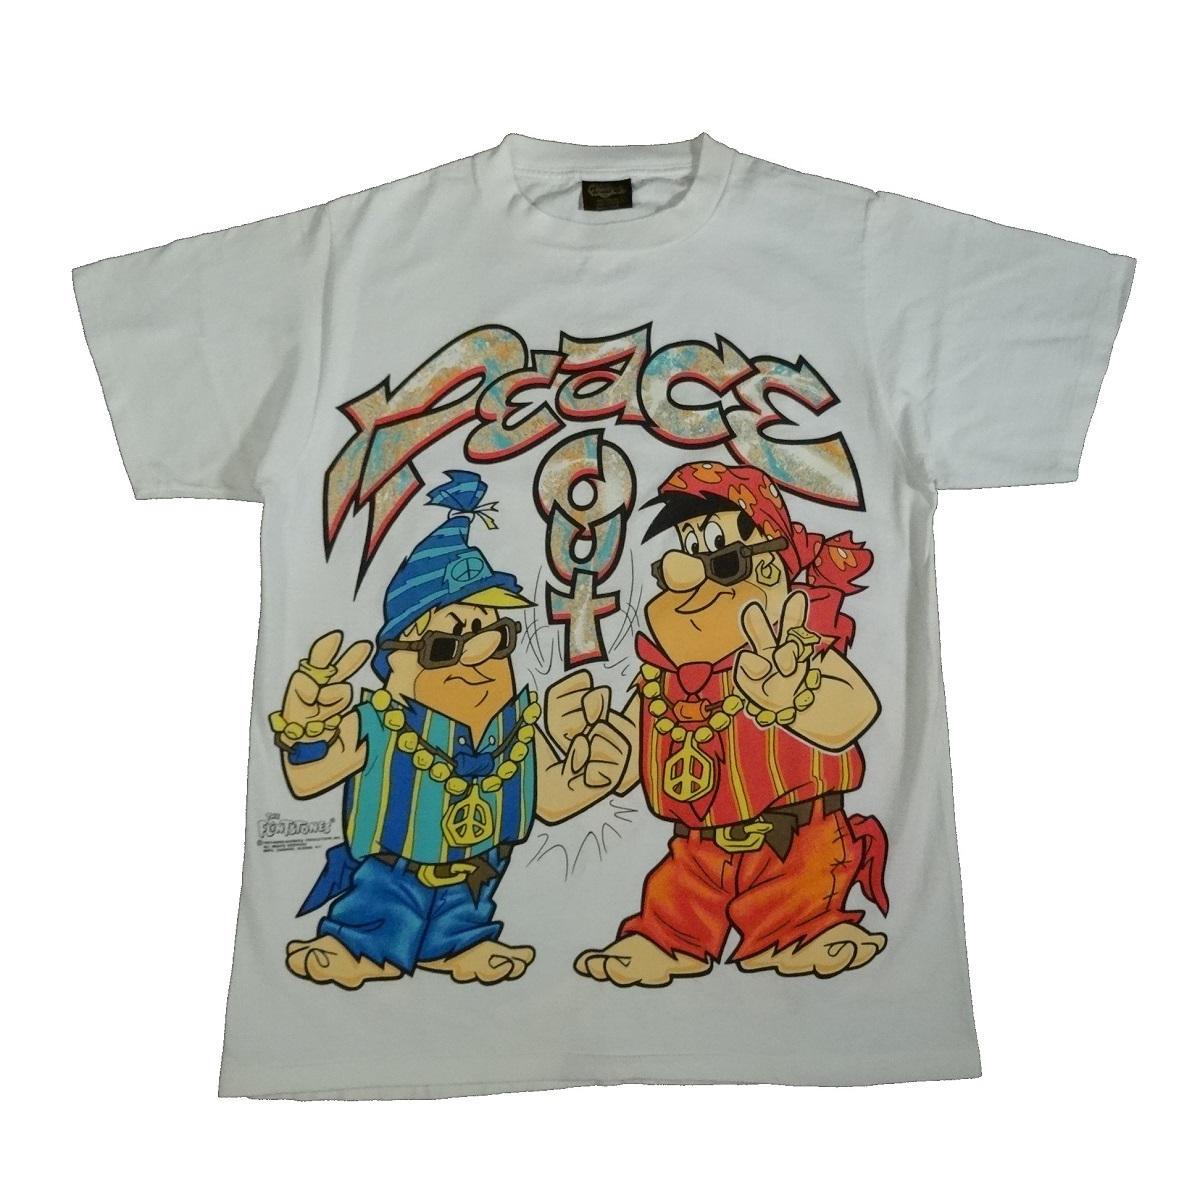 flintstones fred barney t shirt vintage 90s peace out front